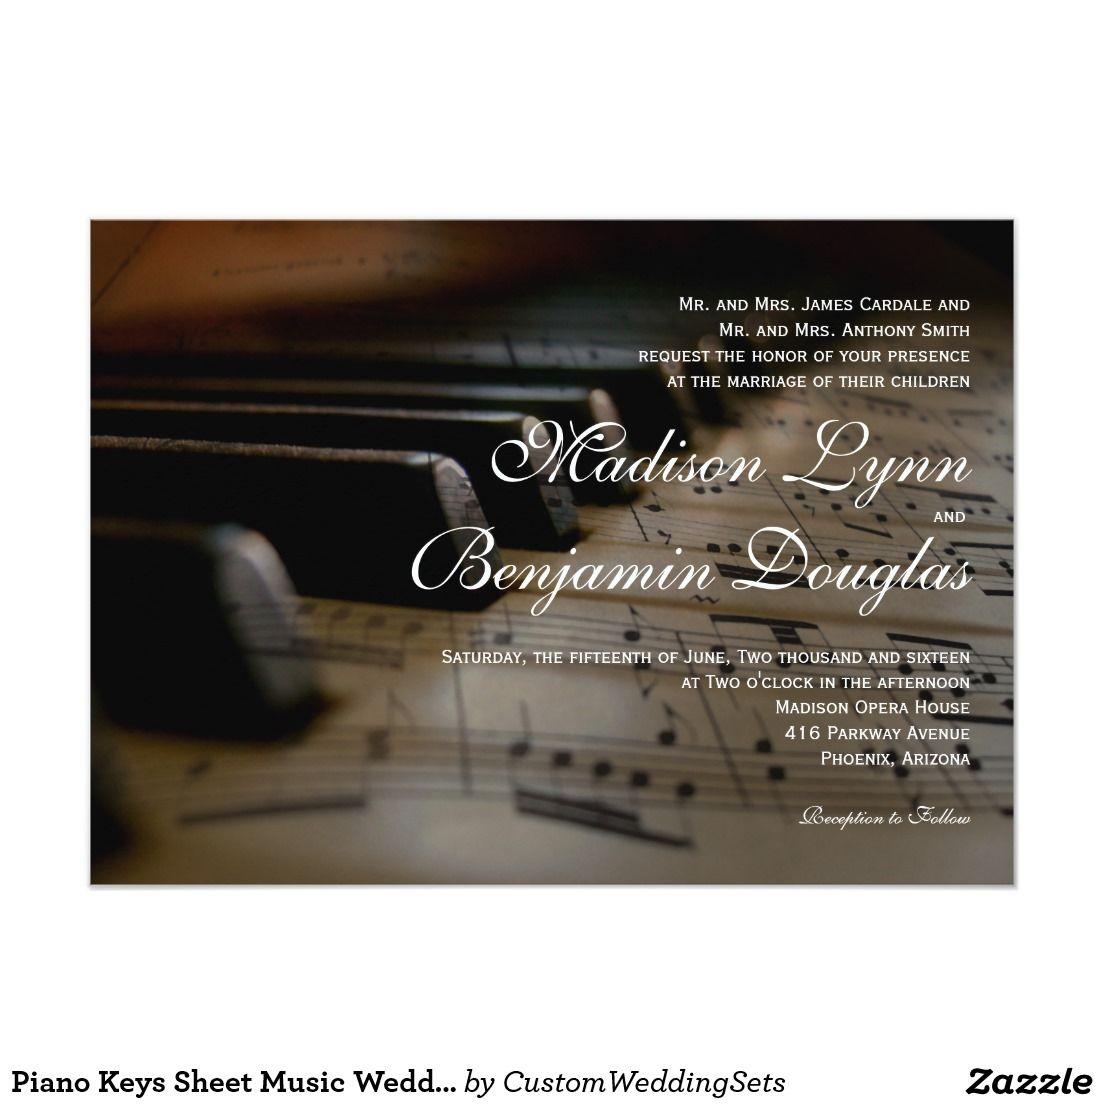 Piano Keys Sheet Music Wedding Invitations  Zazzle.com  Sheet